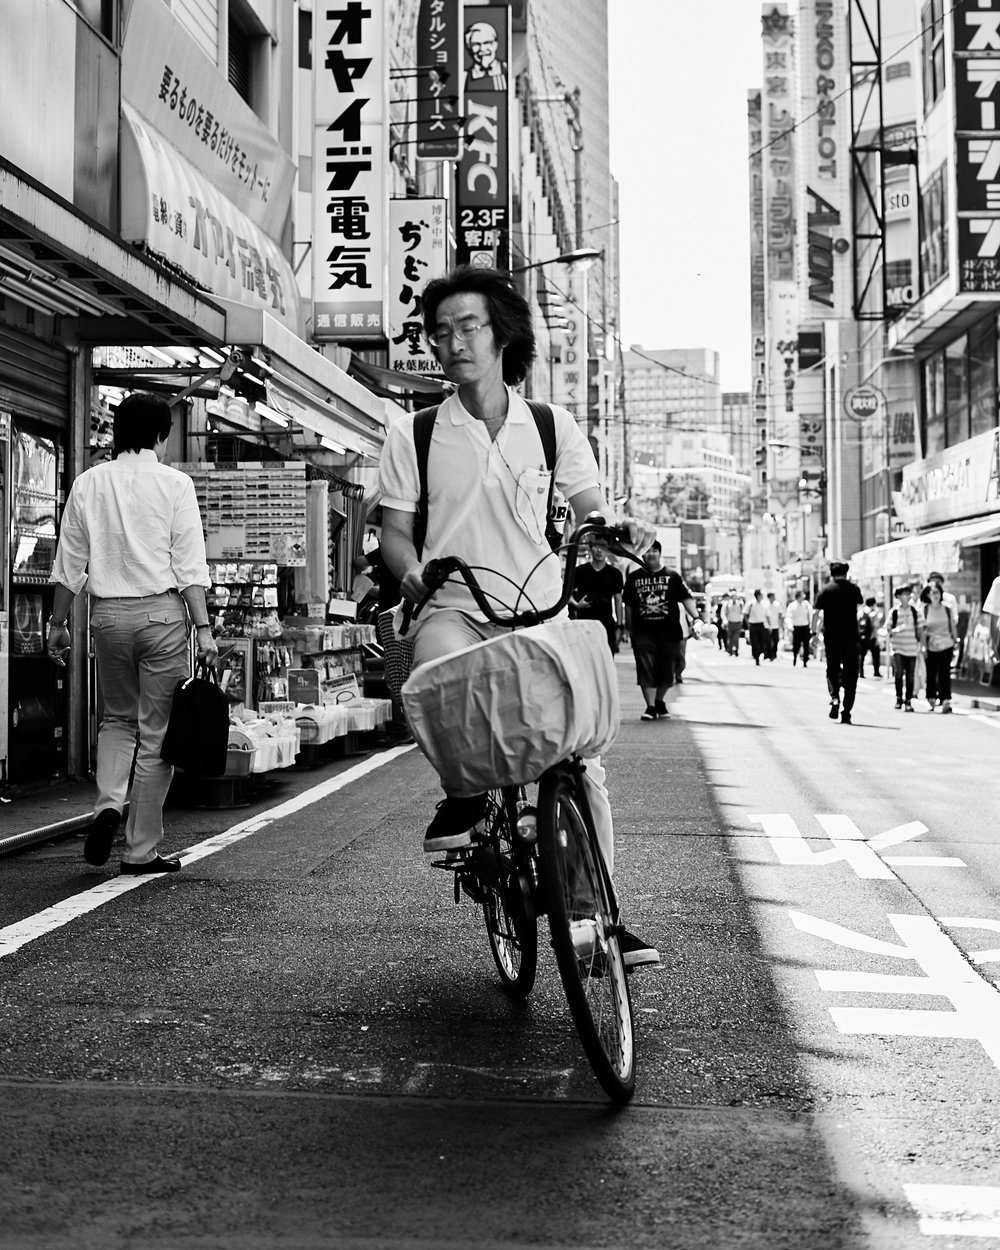 SnapPilots_17-07-06_Tokyo2017_bnw_83.jpg